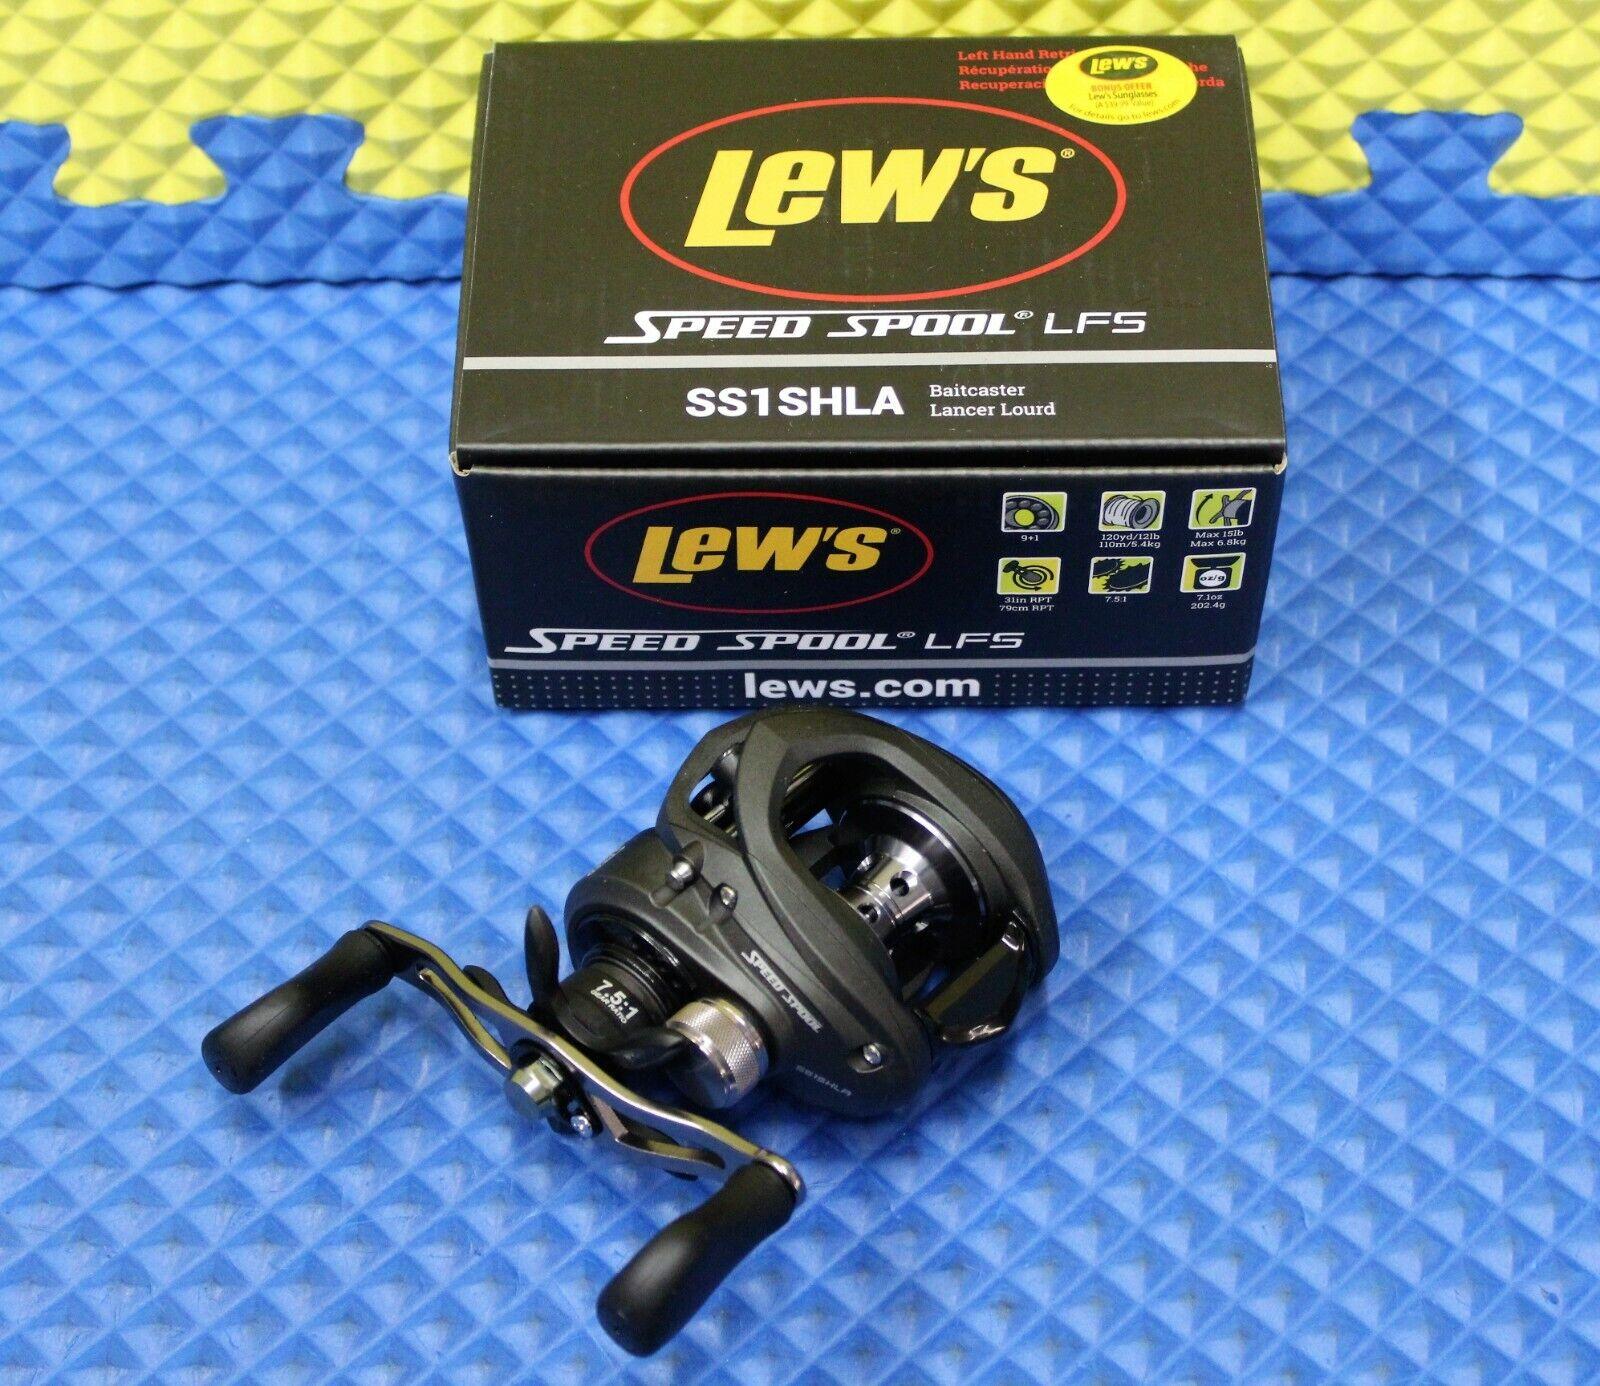 Lew's Speed Spool LFS Series Baitcaster Reel 8BB  1ZRCB LEFT HANDED SS1SHLA